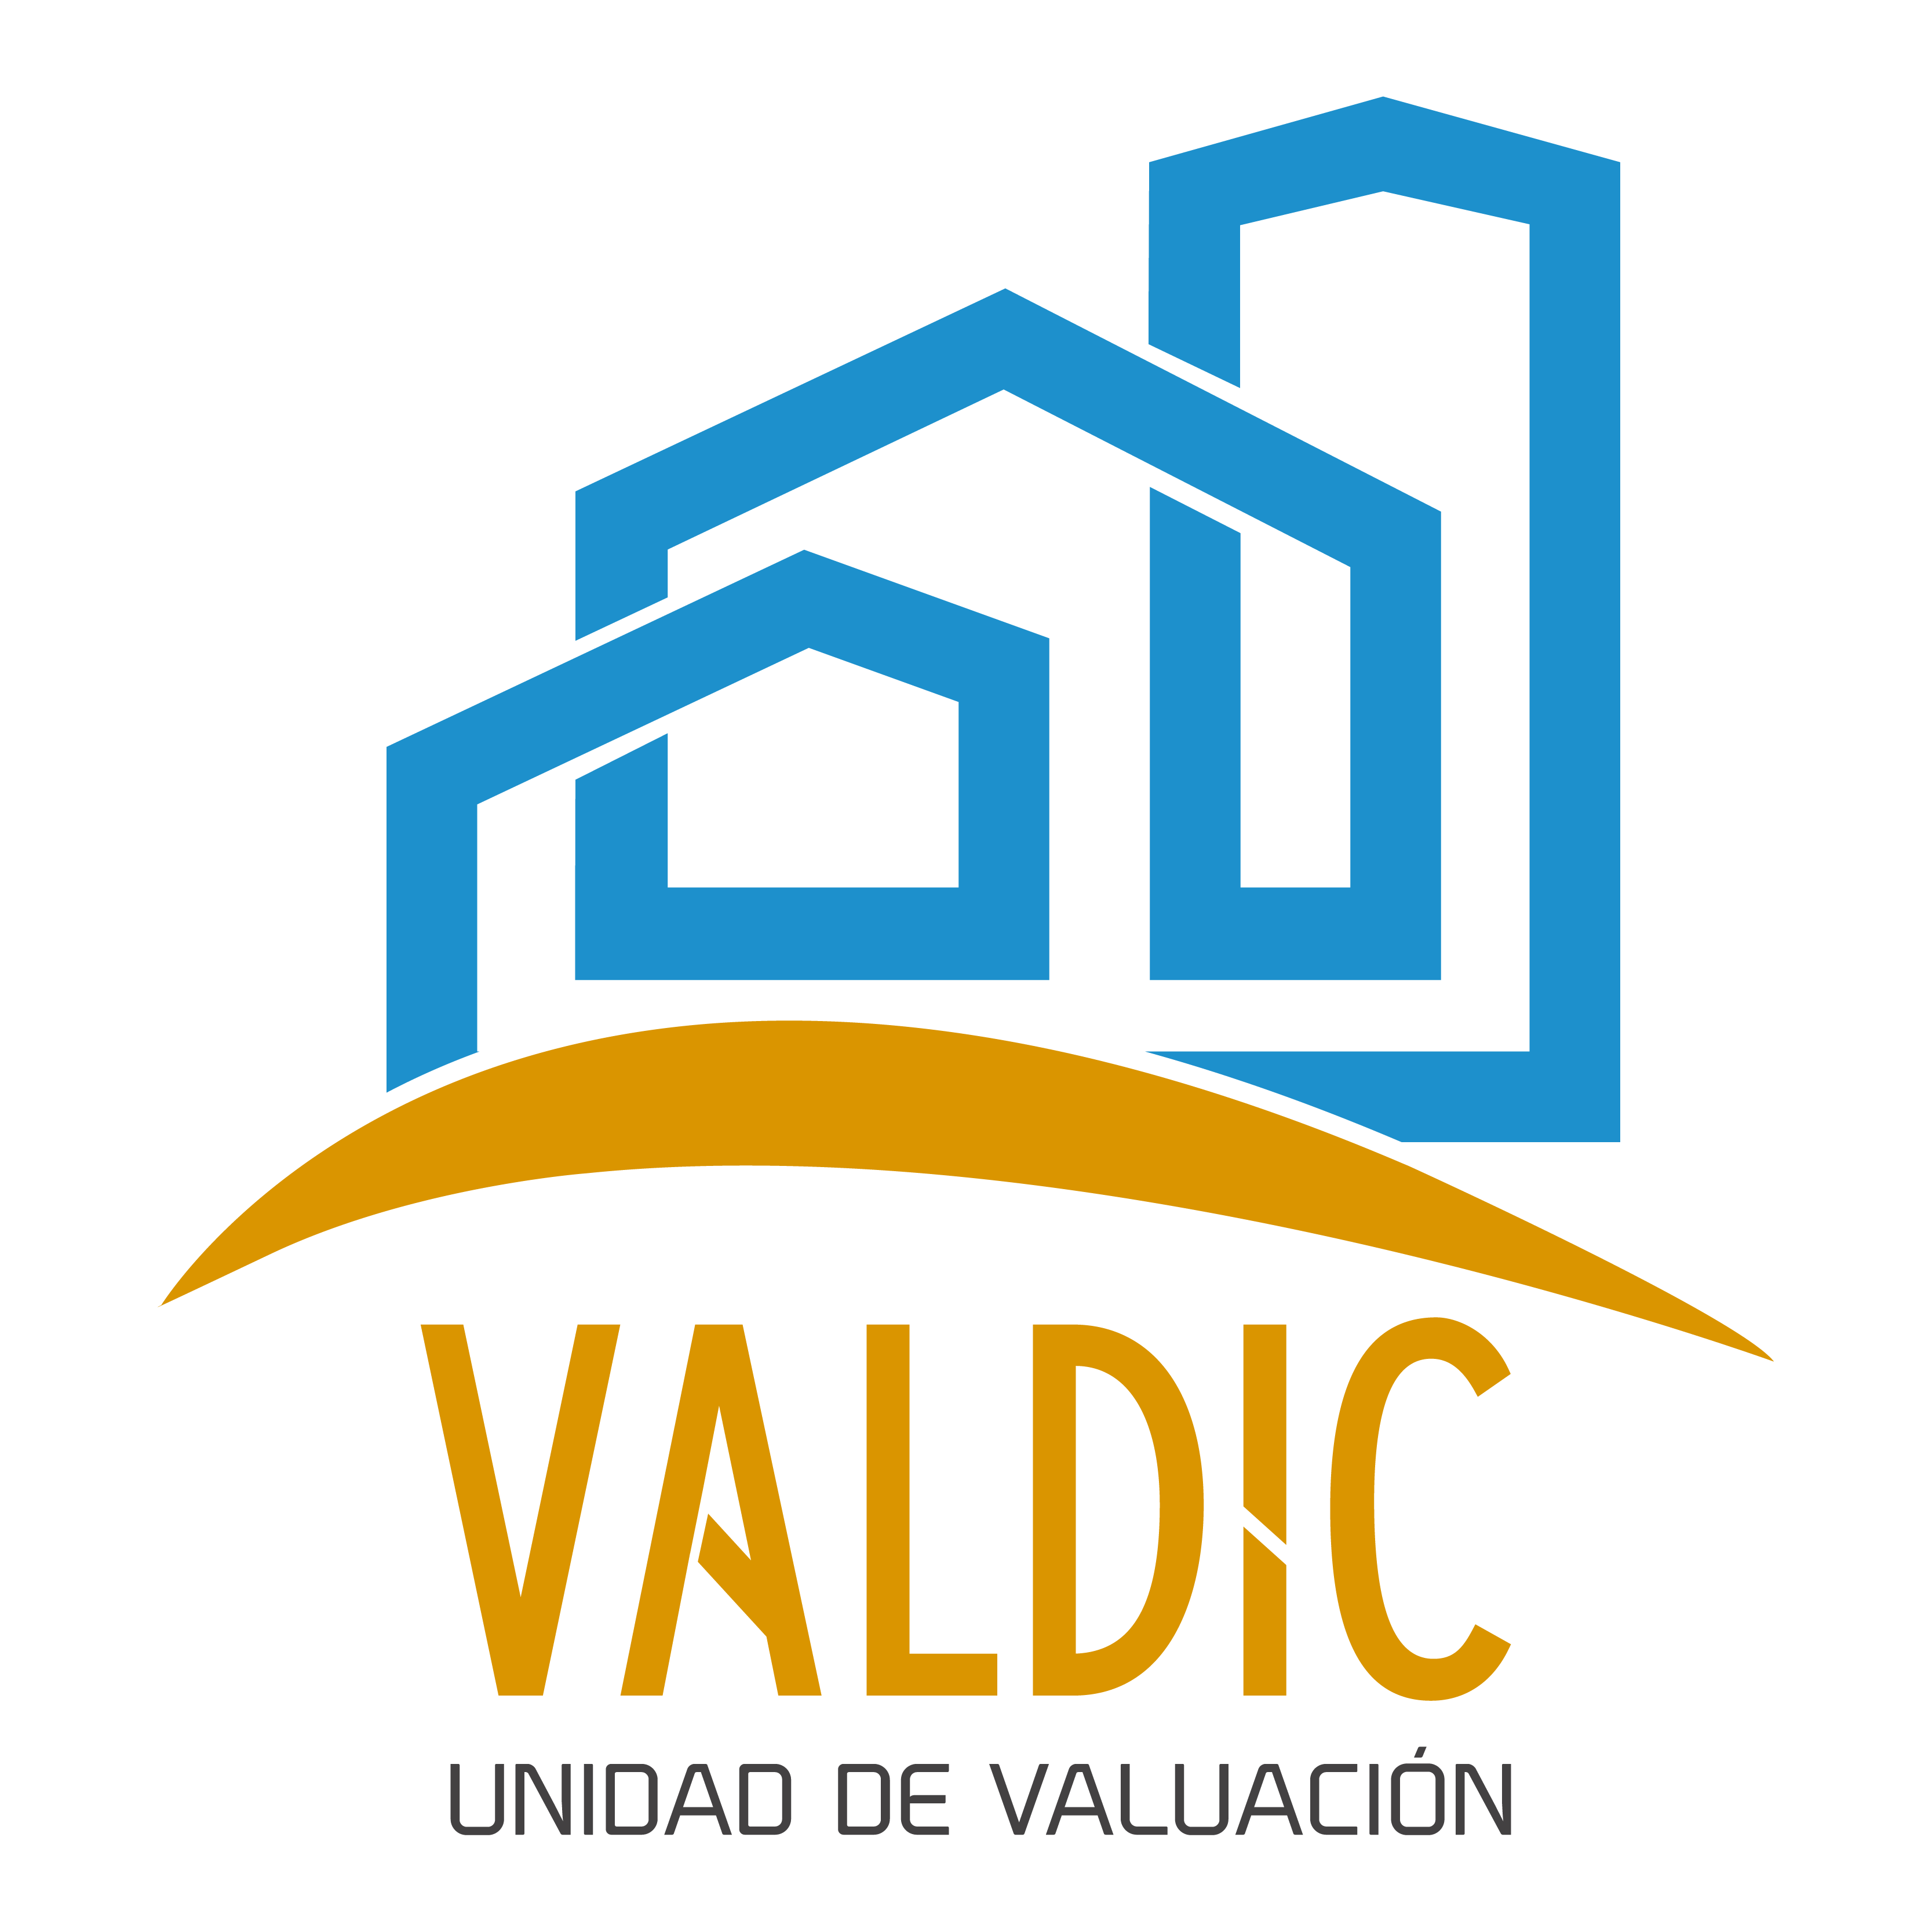 LOGOTIPO_VALDIC-01.png